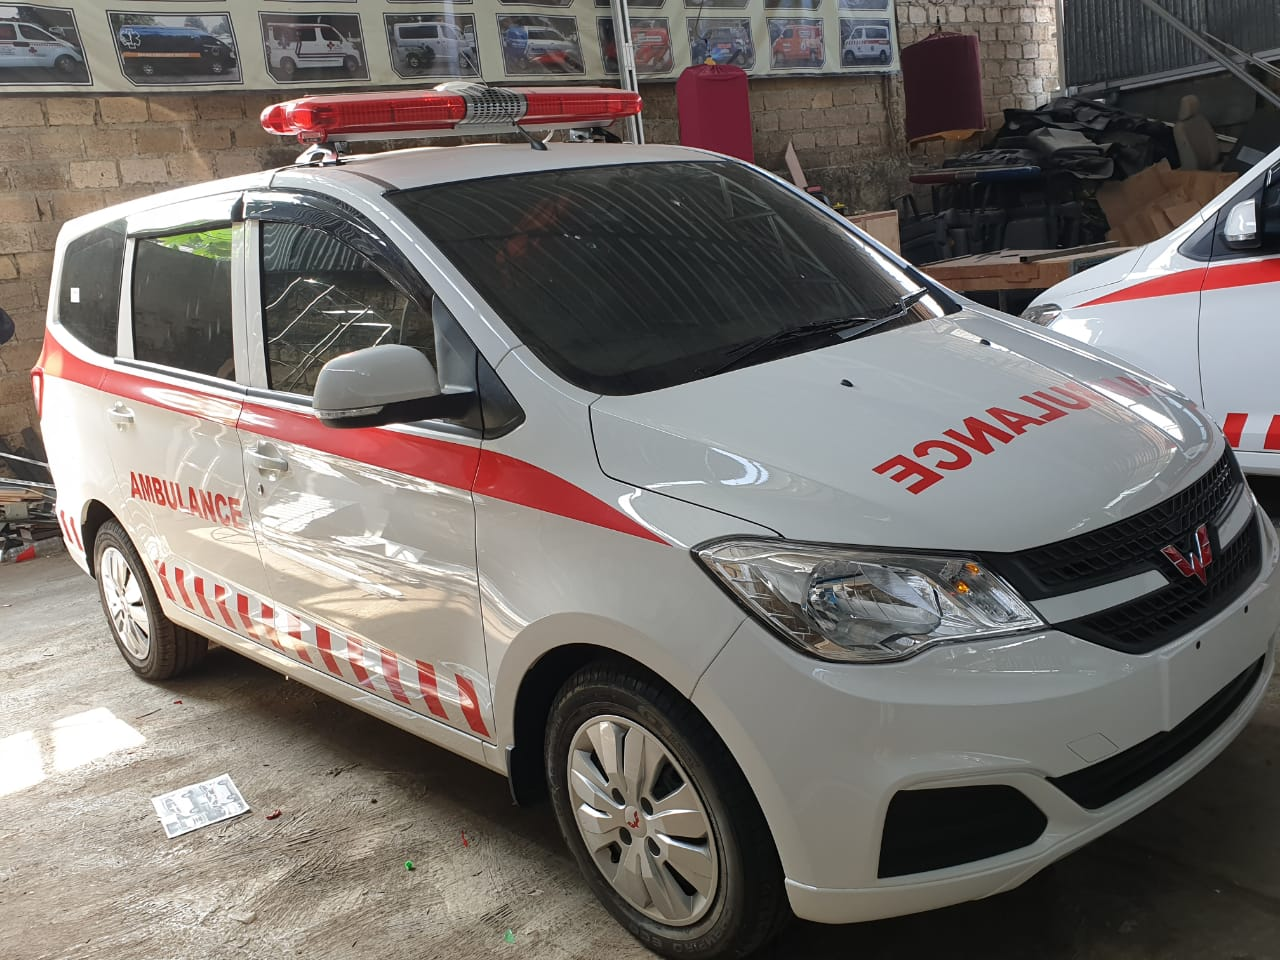 makna sirine ambulance